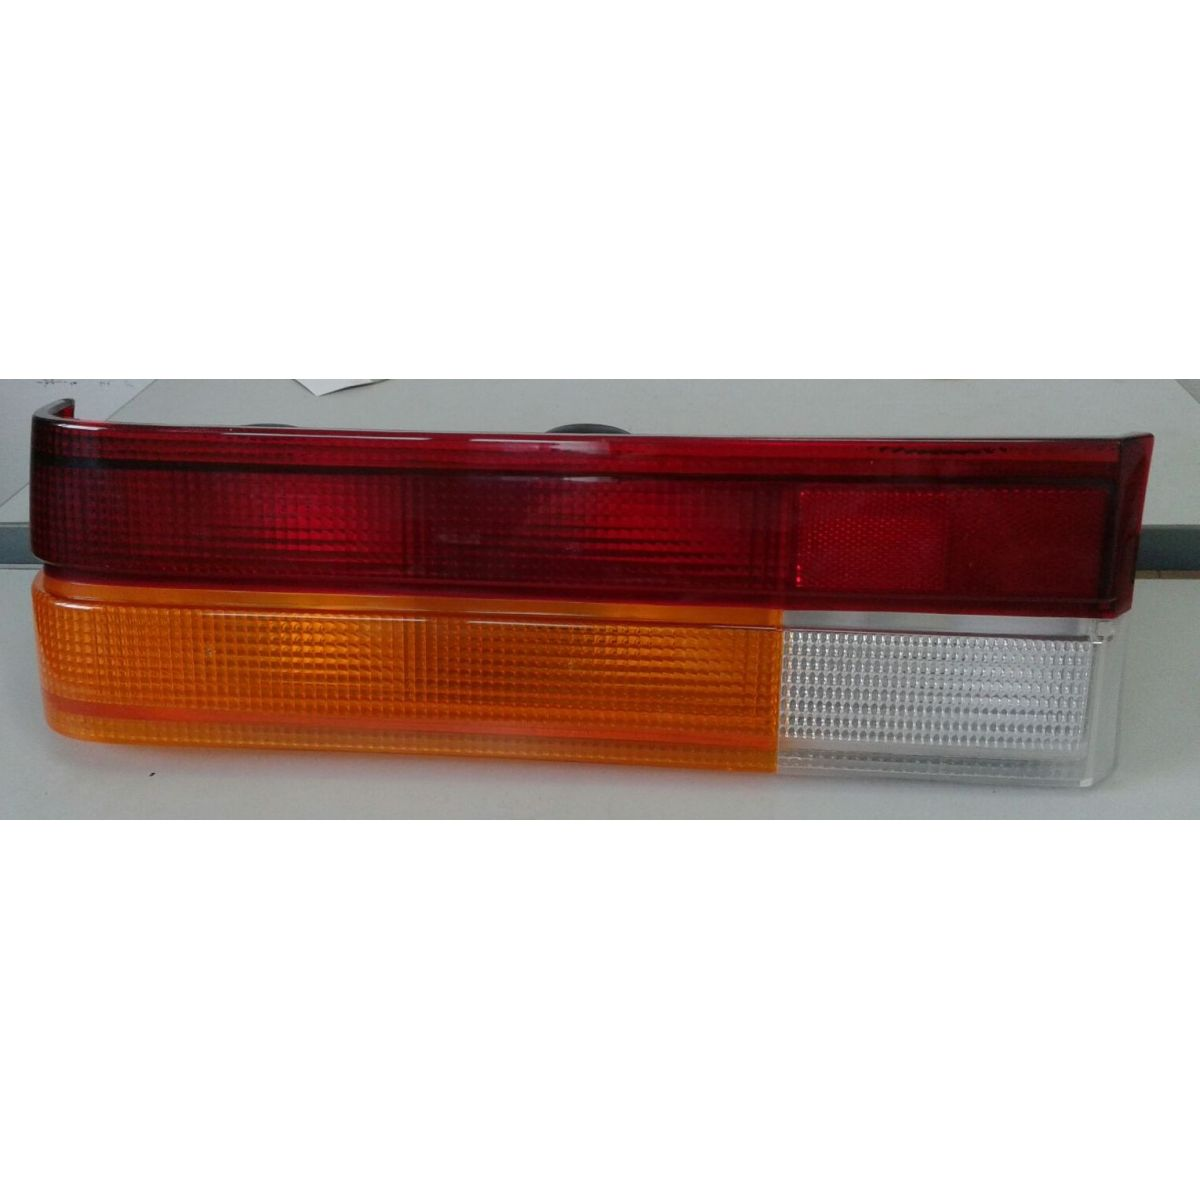 Lanterna Traseira Opala 85 a 87 Tricolor  - Amd Auto Peças